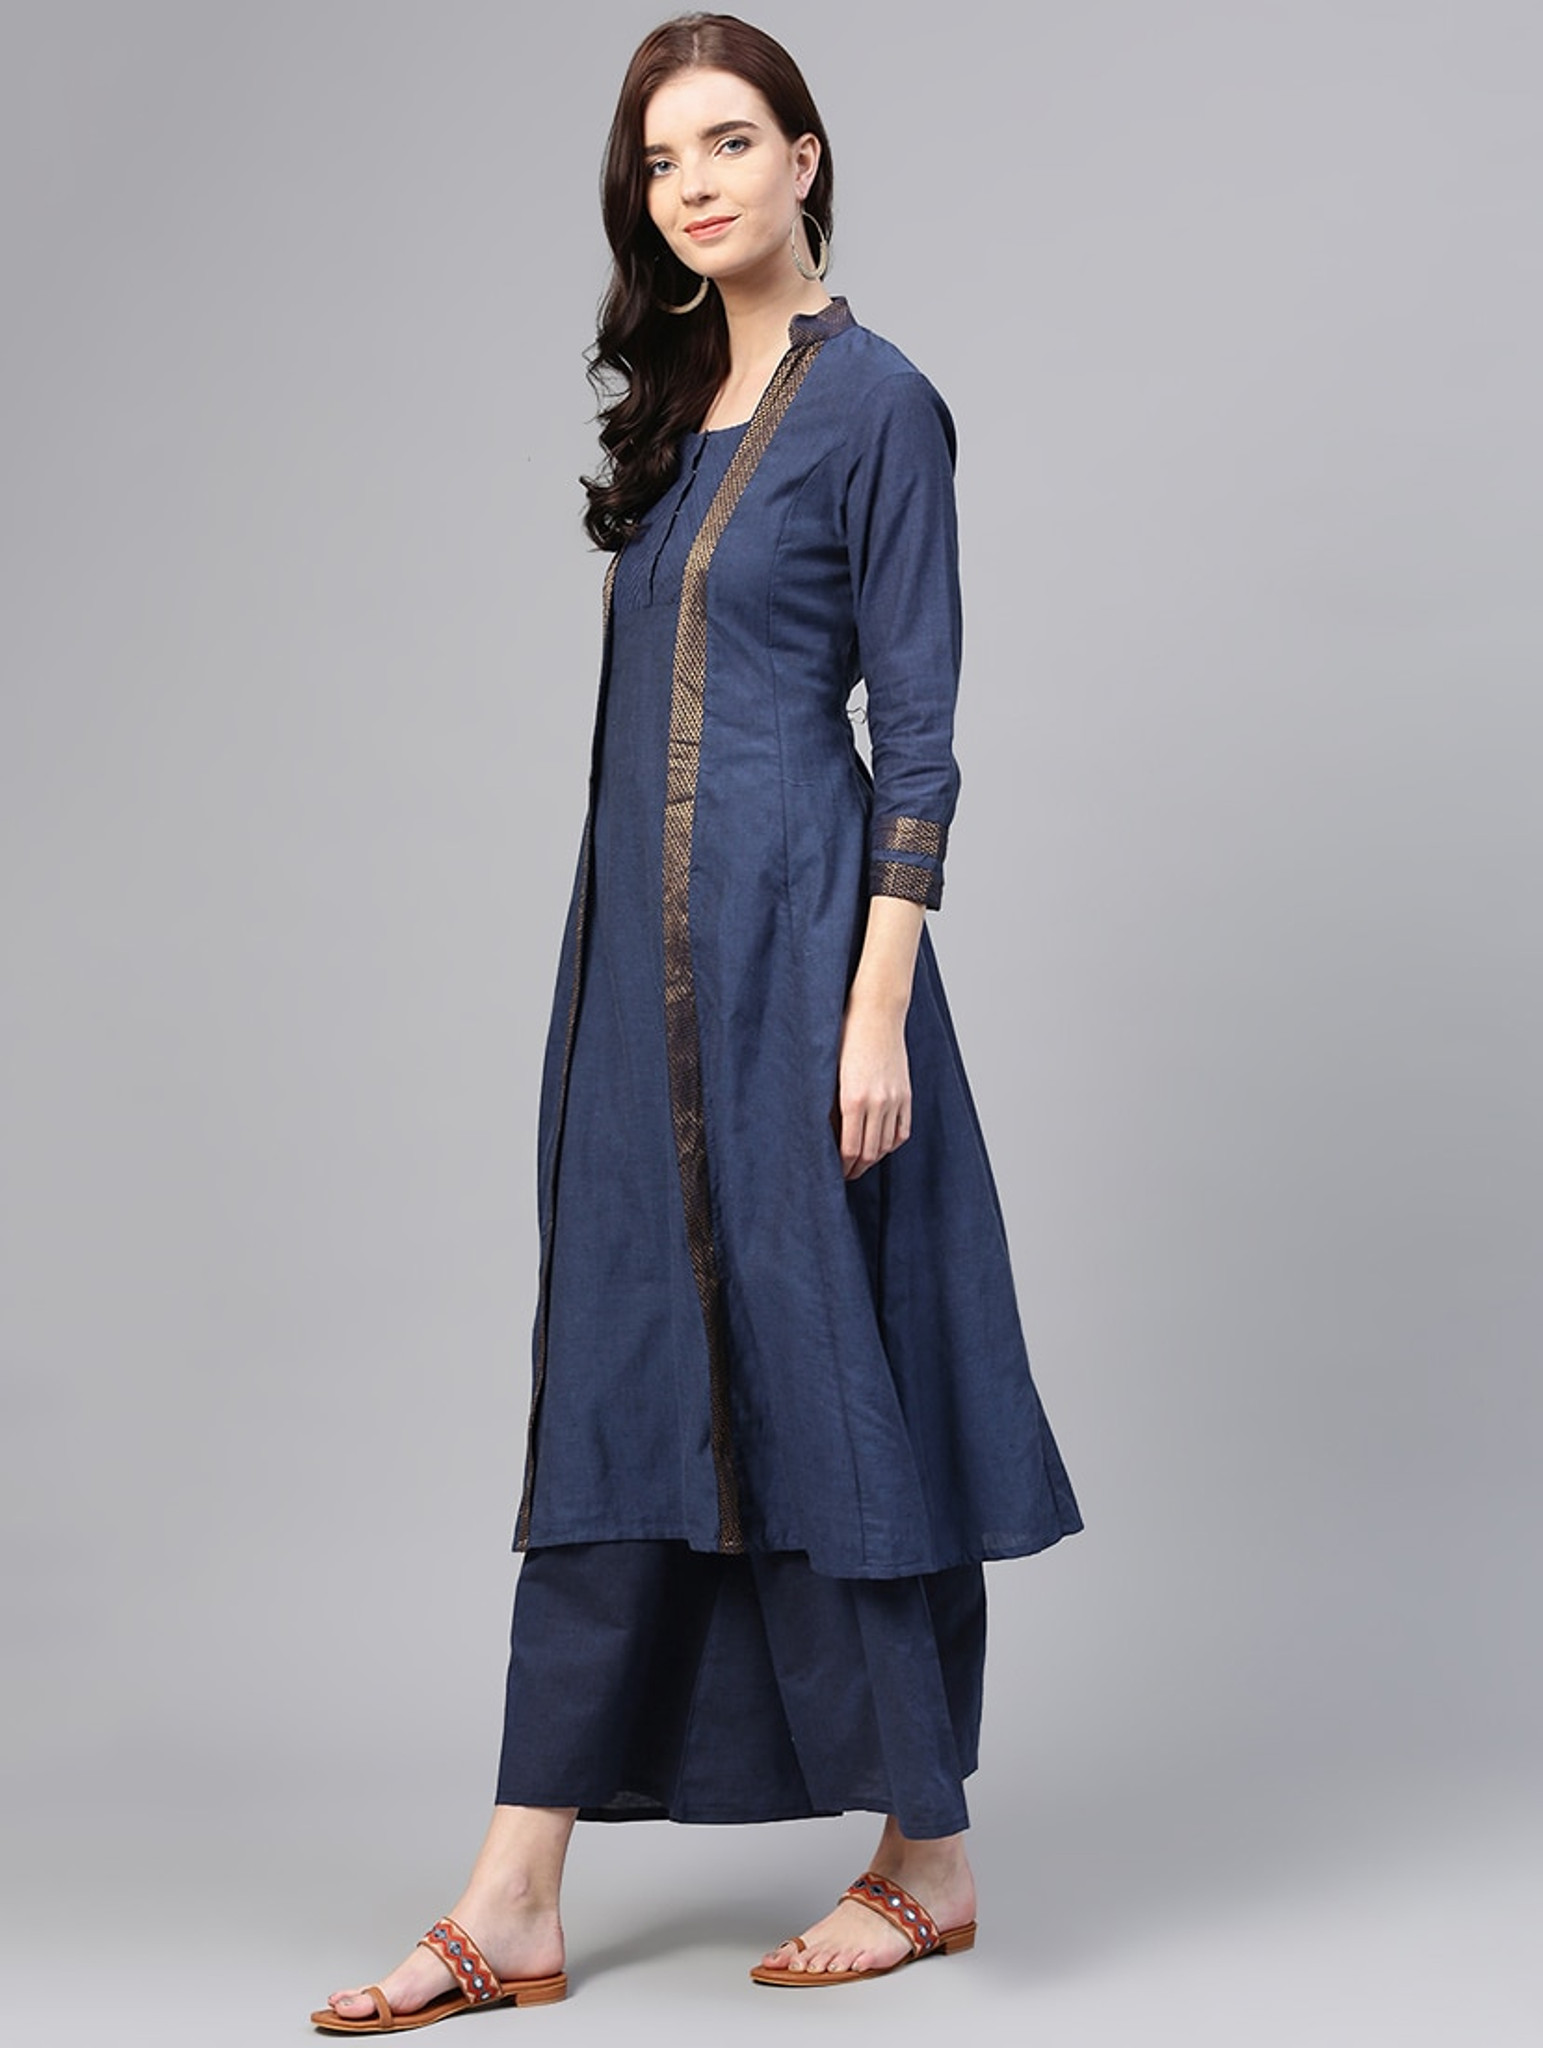 Fifth Avenue Women's TPS126 Cotton Lace Detail Kurti and Palazzo Set - Blue